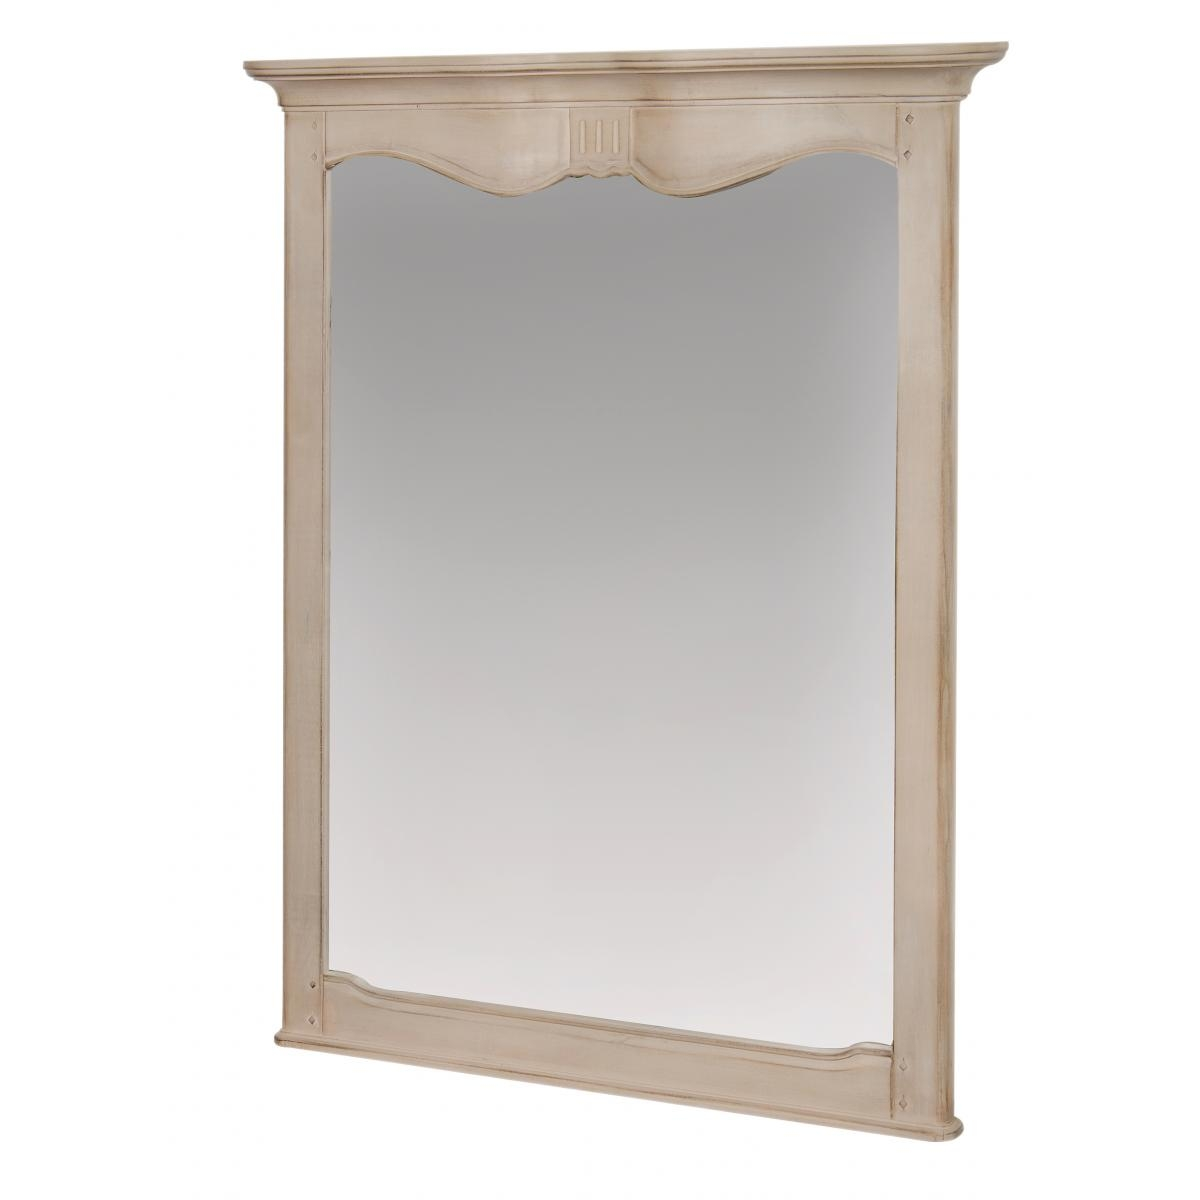 Oglinda Decorativa Lemn Mesteacan Venezia Ve K